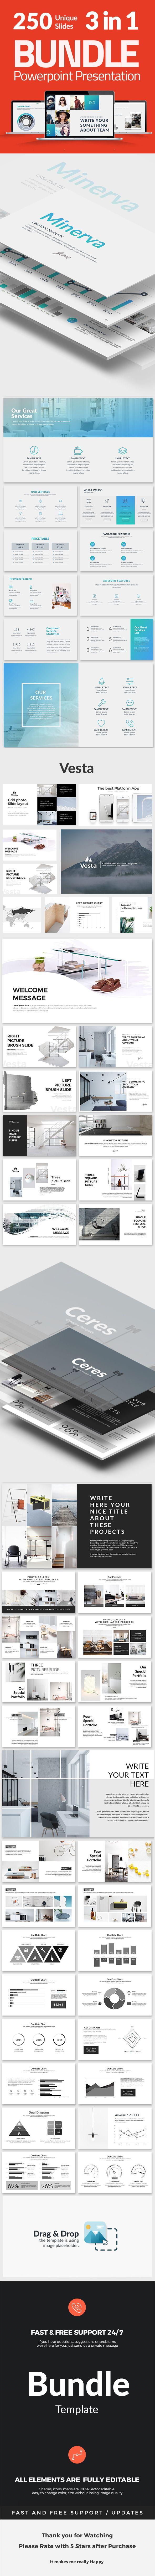 December Bundle - Best Creative Powerpoint Template - Creative PowerPoint Templates